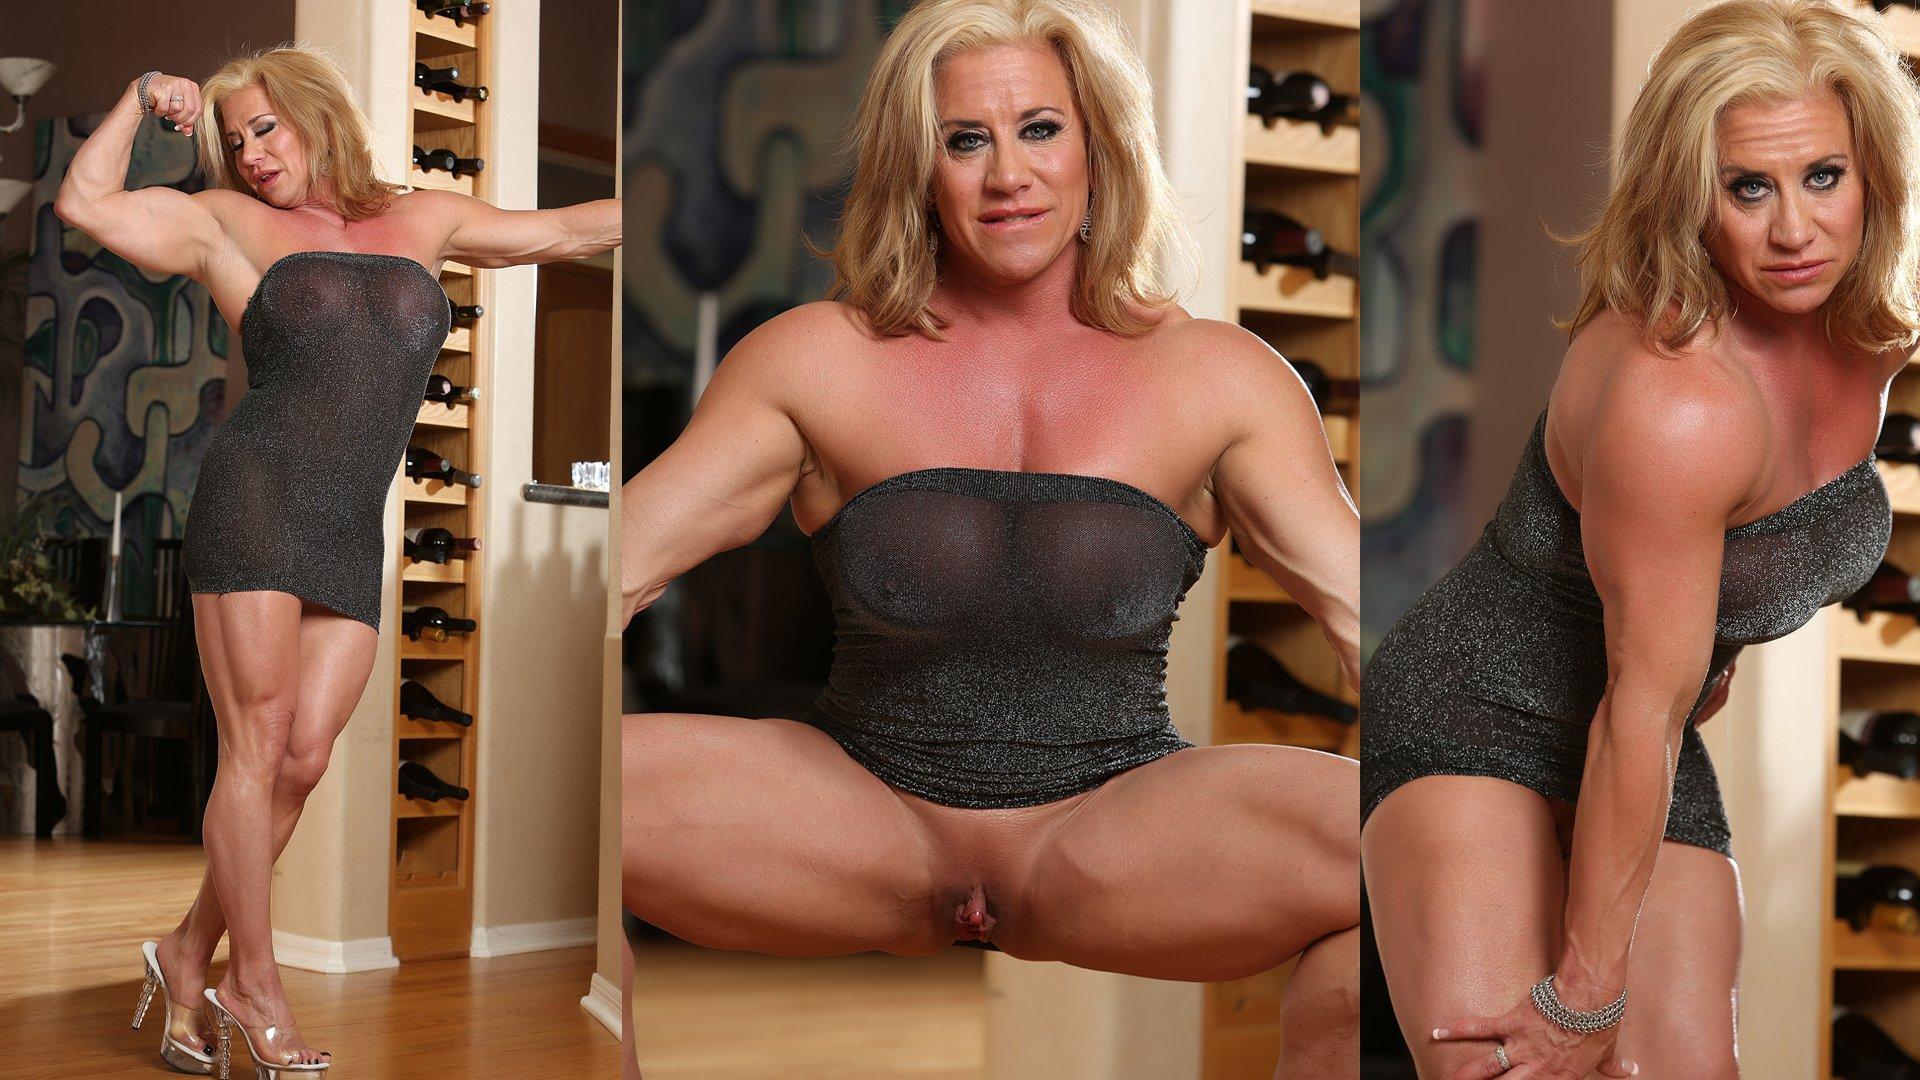 Muscle MILFs Volume 3: Wanda More 3